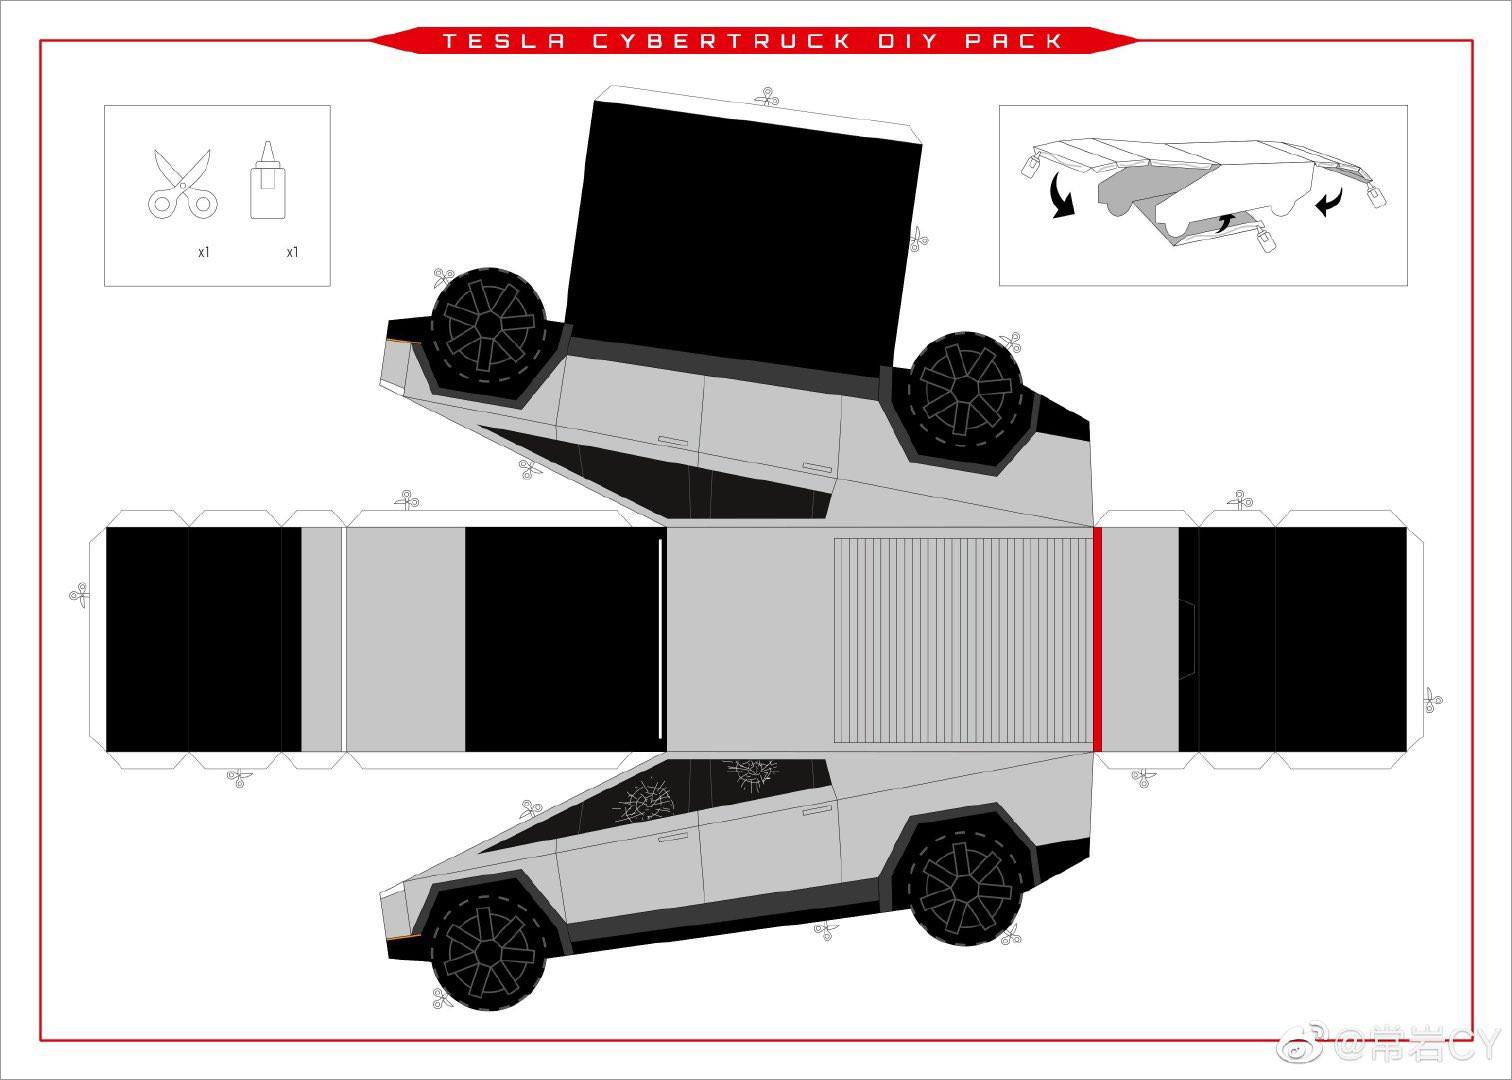 Papercraft Car Papercraft Car Tesla Cybertruck Paper Model